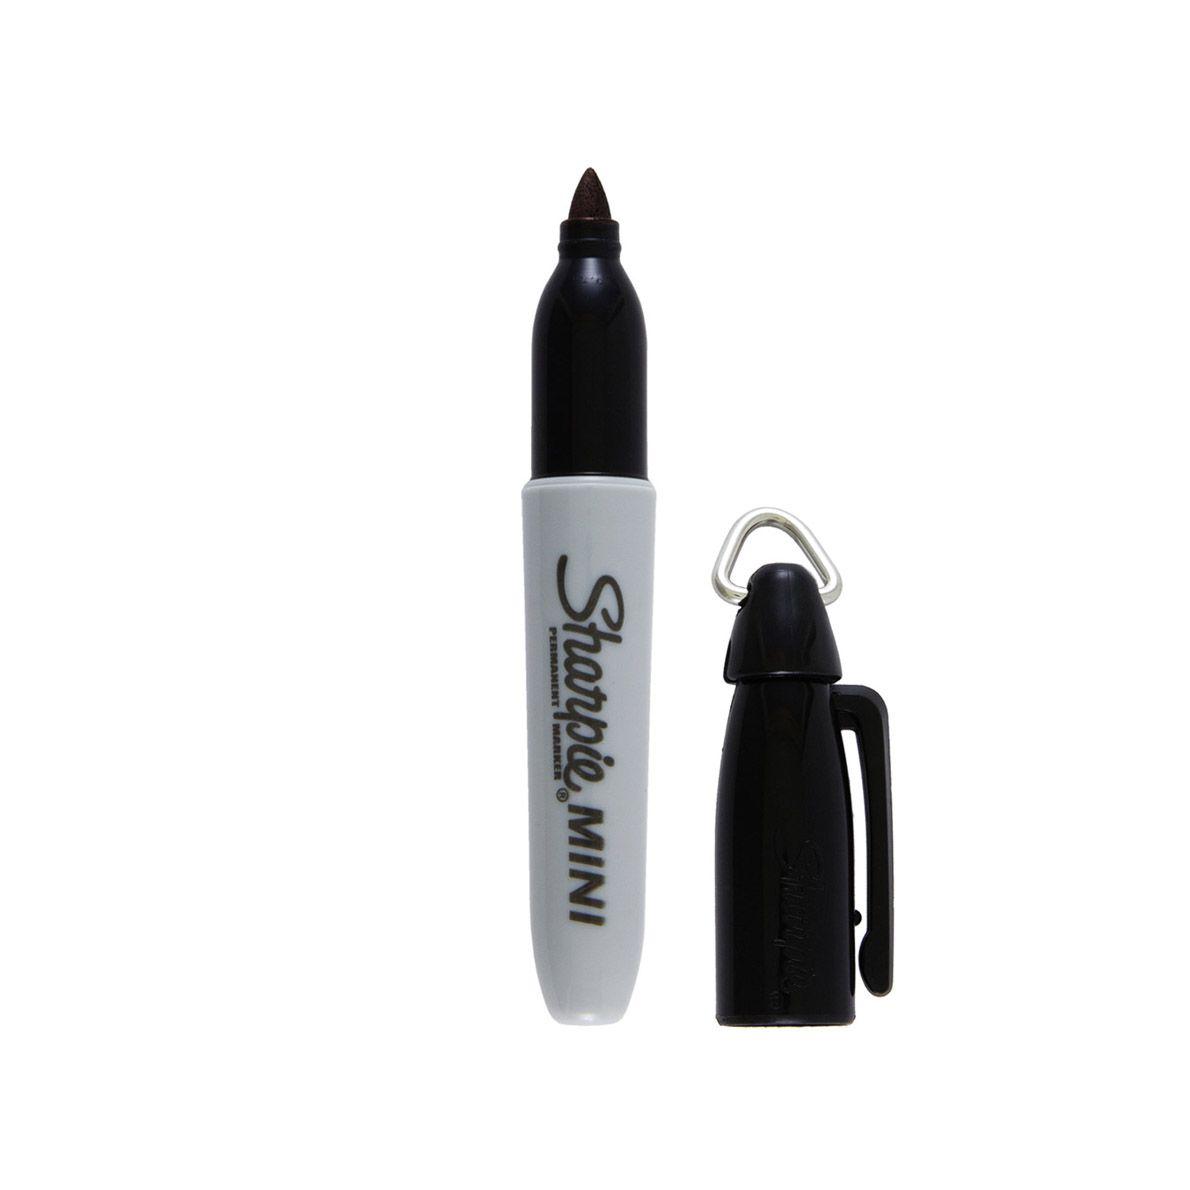 Kit 4 Cores de Caneta Permanente Sharpie Mini Marcador Universal c/ Argola